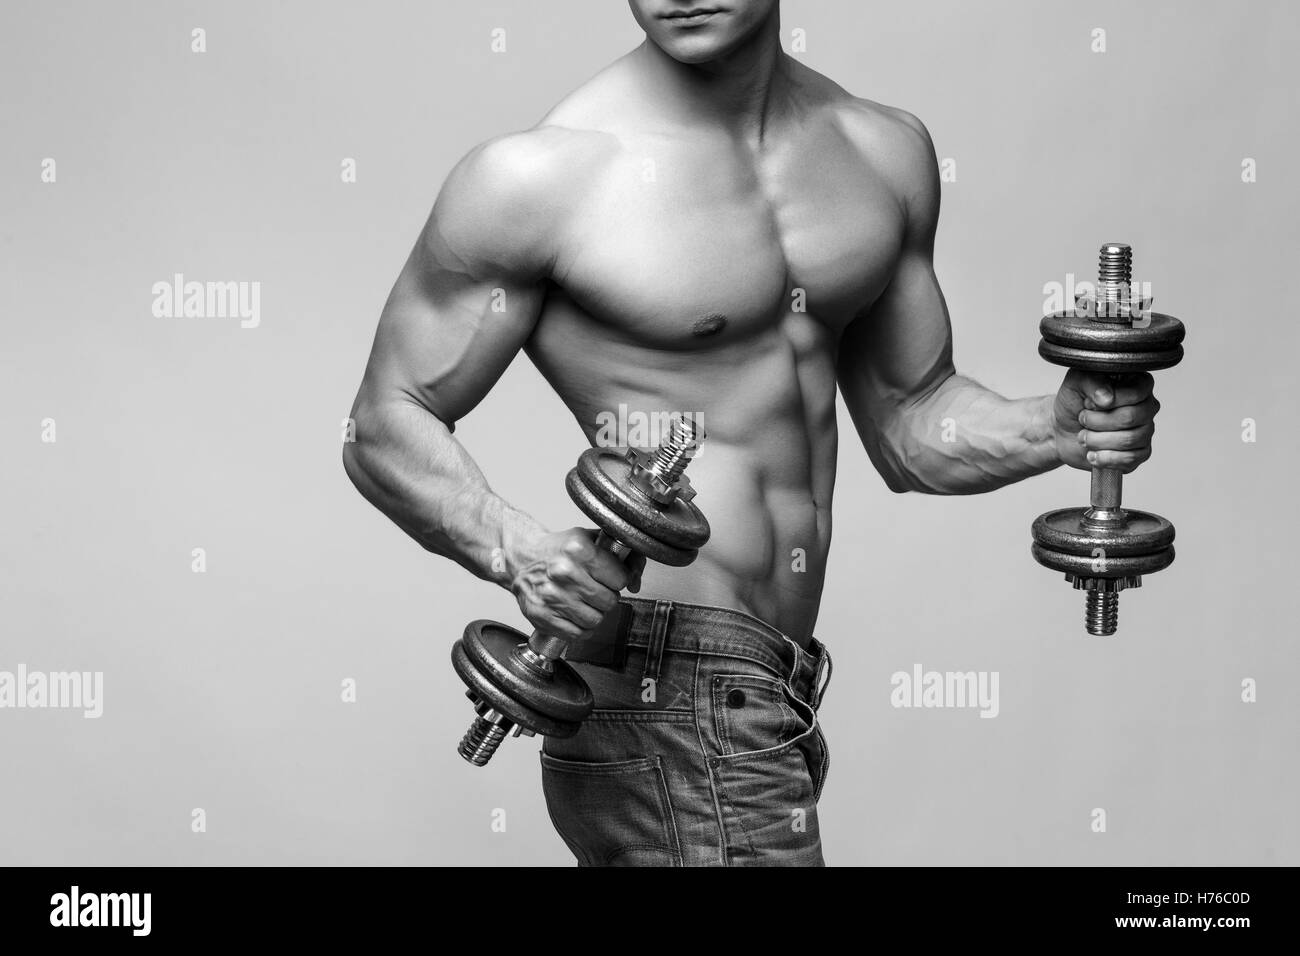 Pecs Arms Biceps Stockfotos & Pecs Arms Biceps Bilder - Alamy